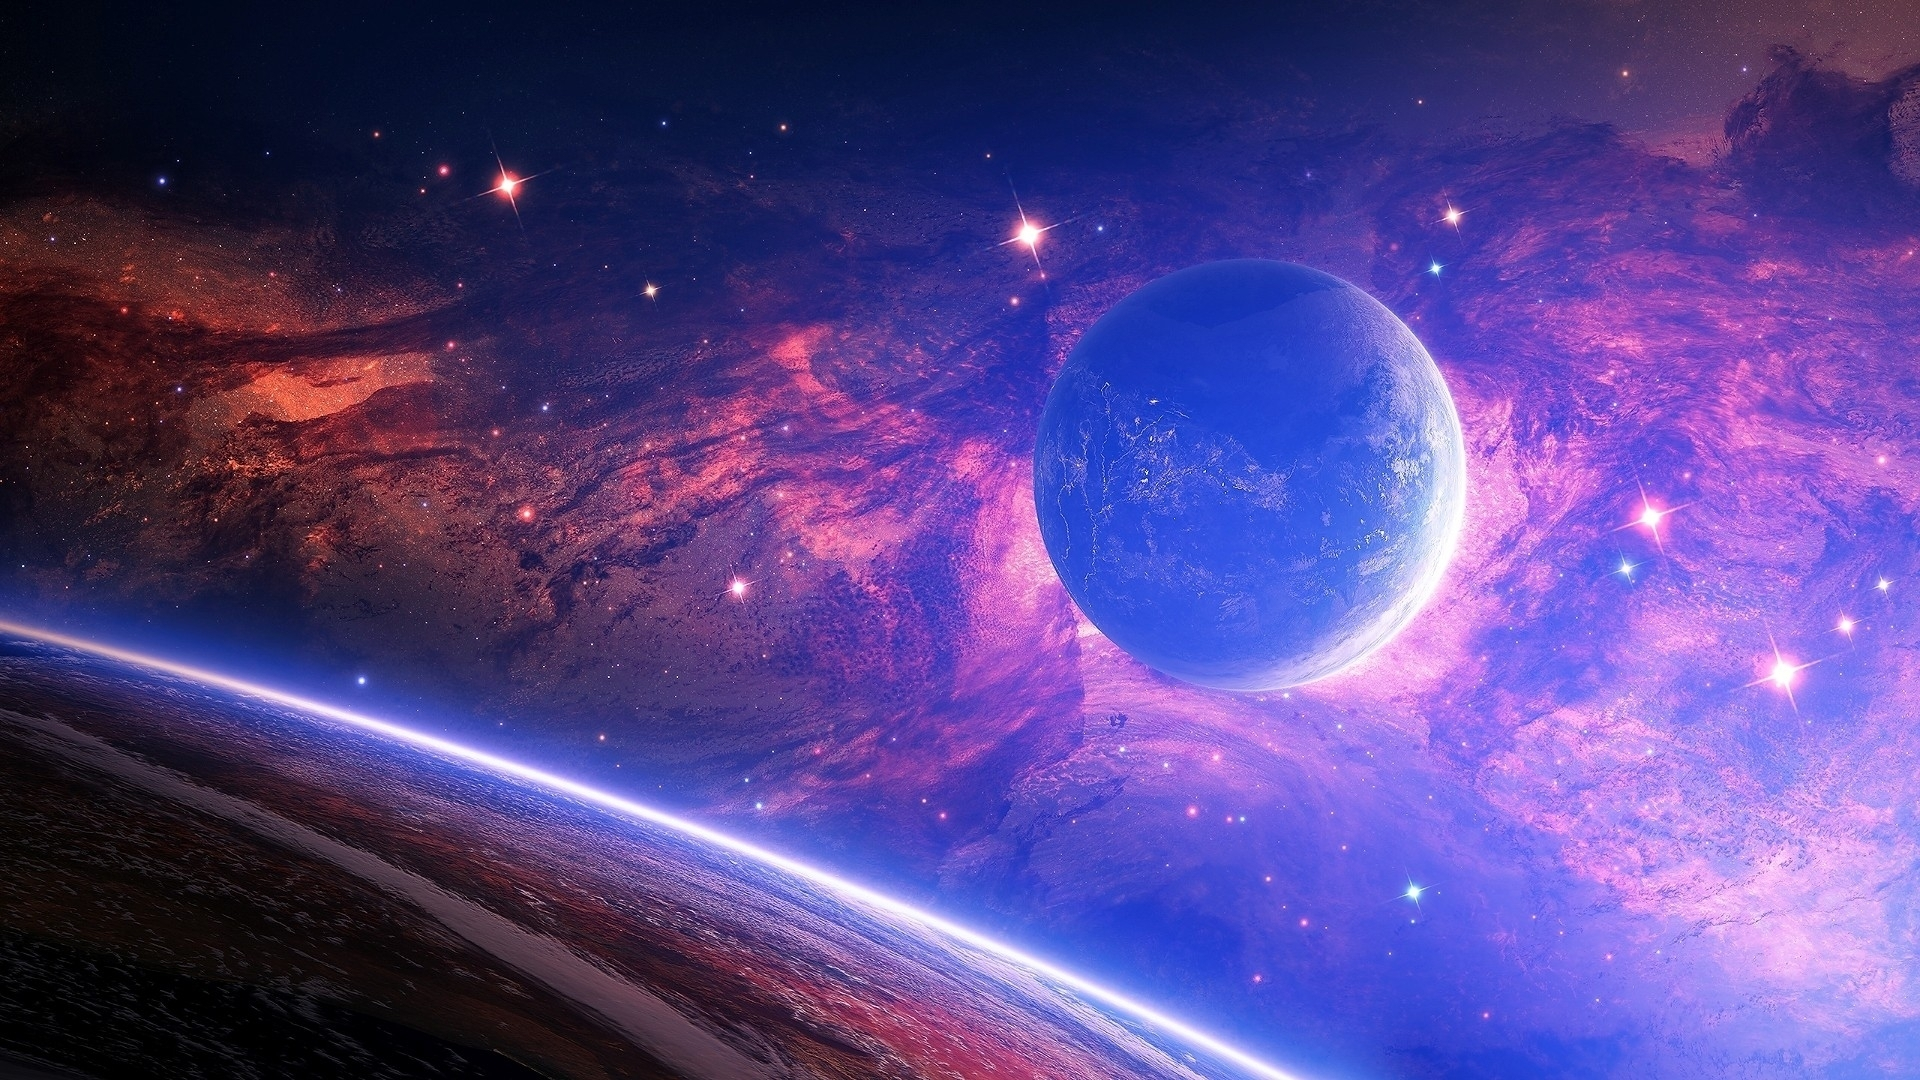 wallpaper : planet, light, spots, space 1920x1080 - goodfon